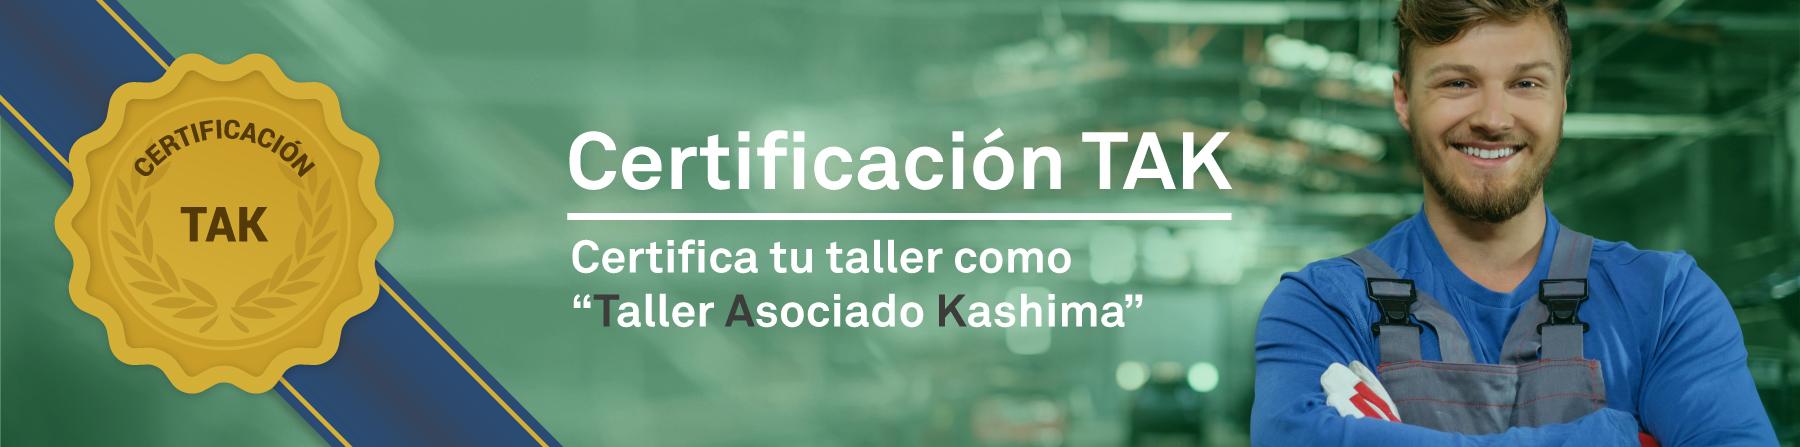 Certificación MAK